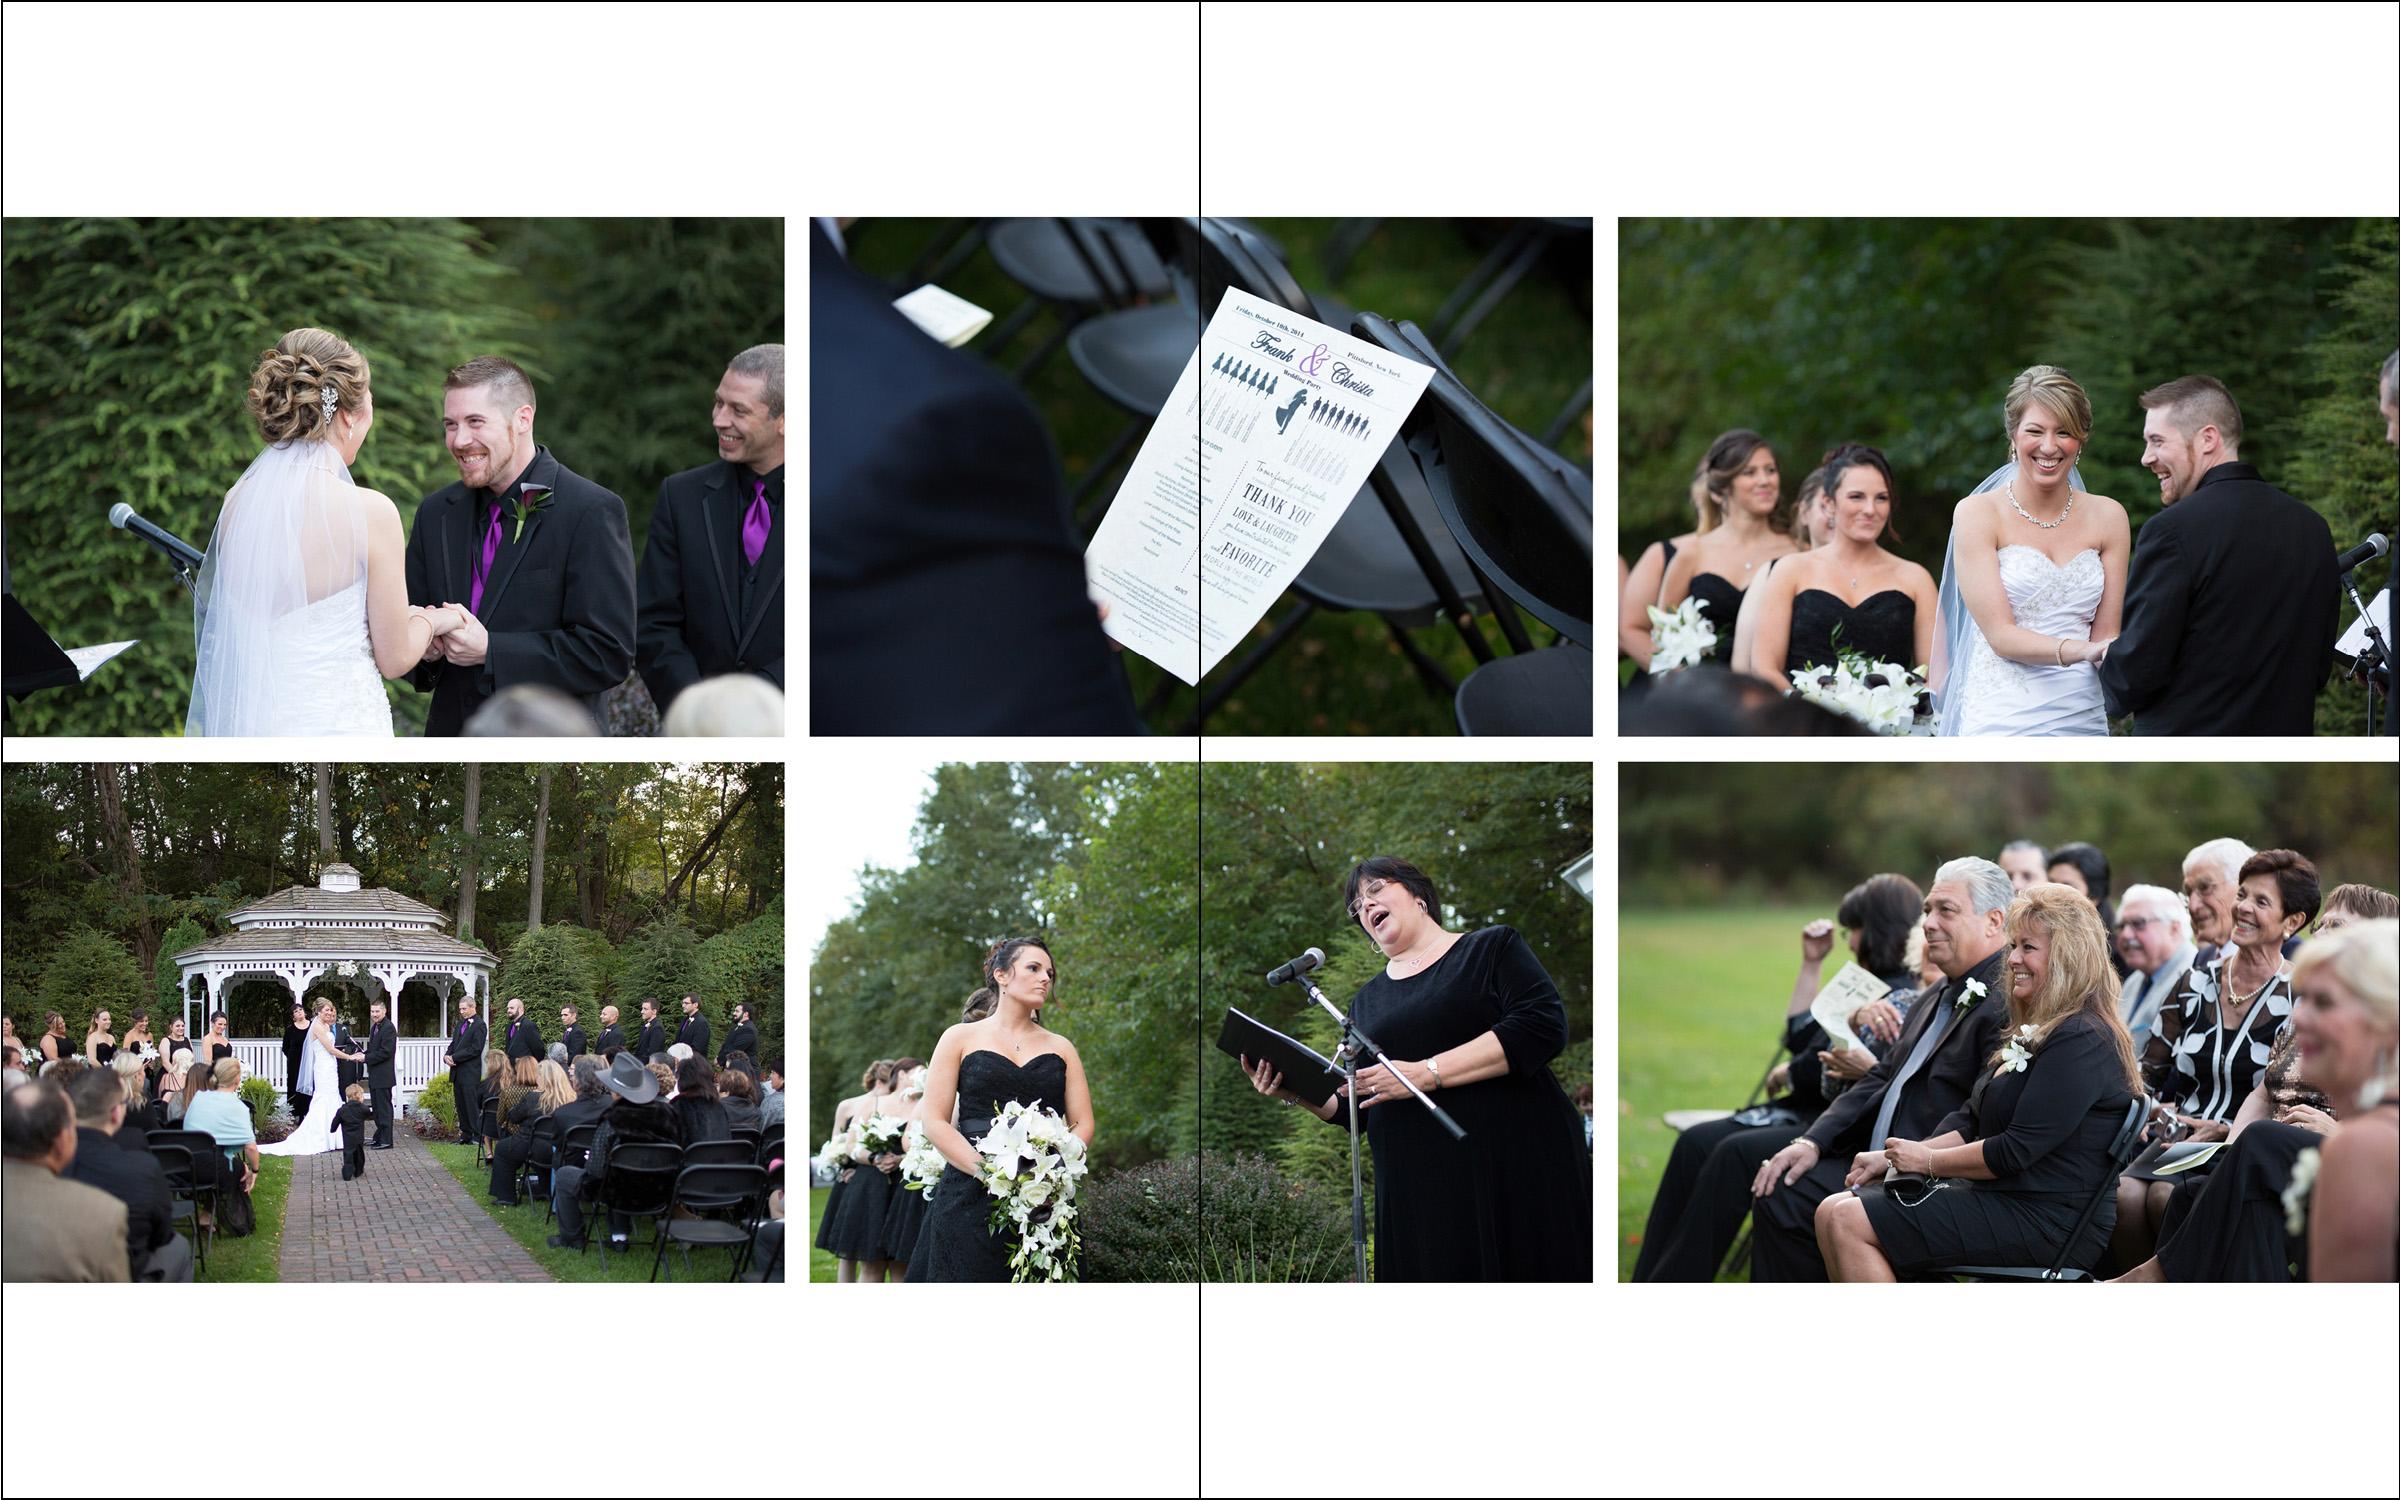 8x10 Wedding Album6.jpg